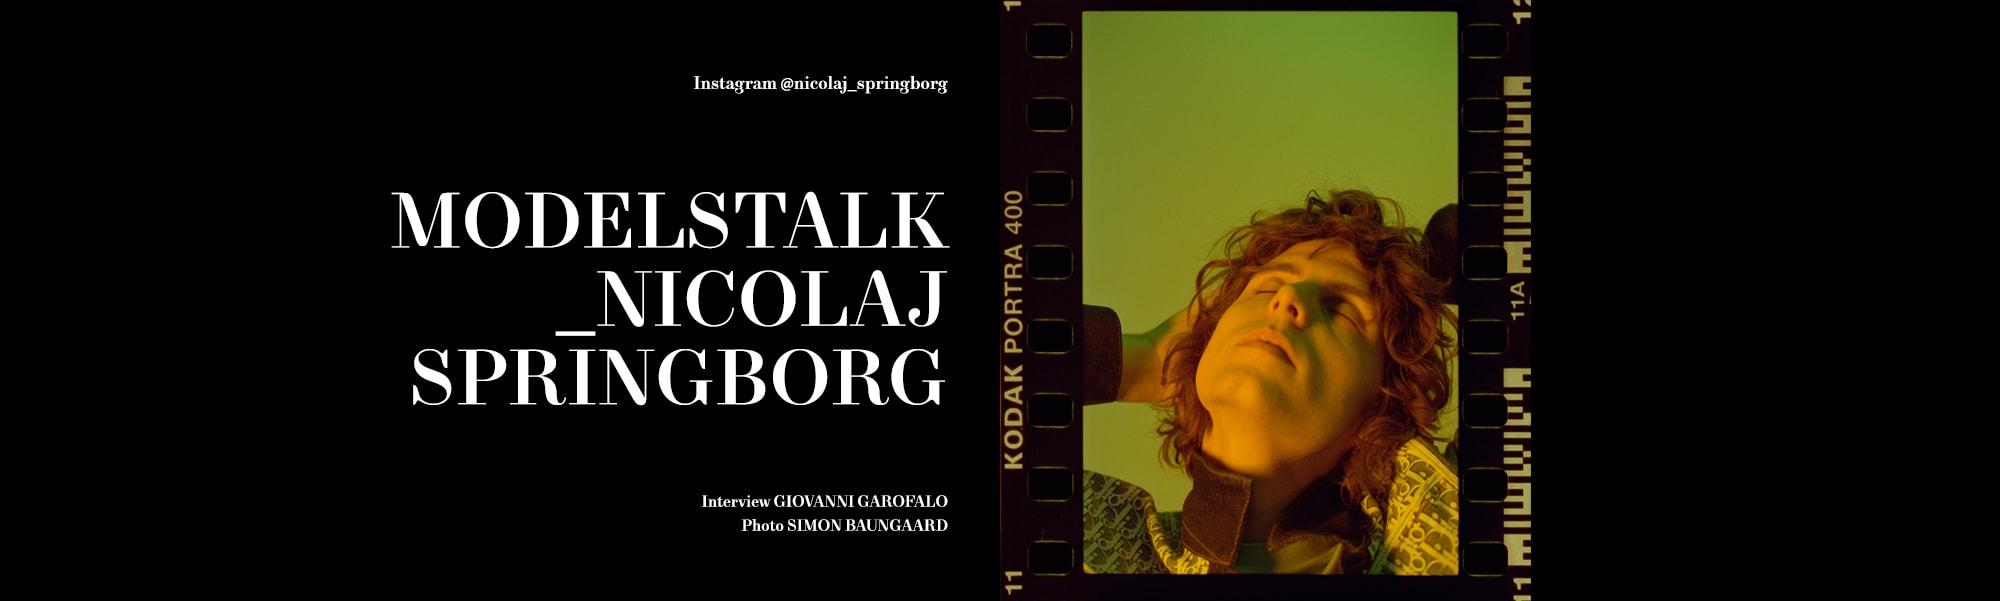 talking-heads-nicolaj- springborg-thegreatestmagazine-main-banner